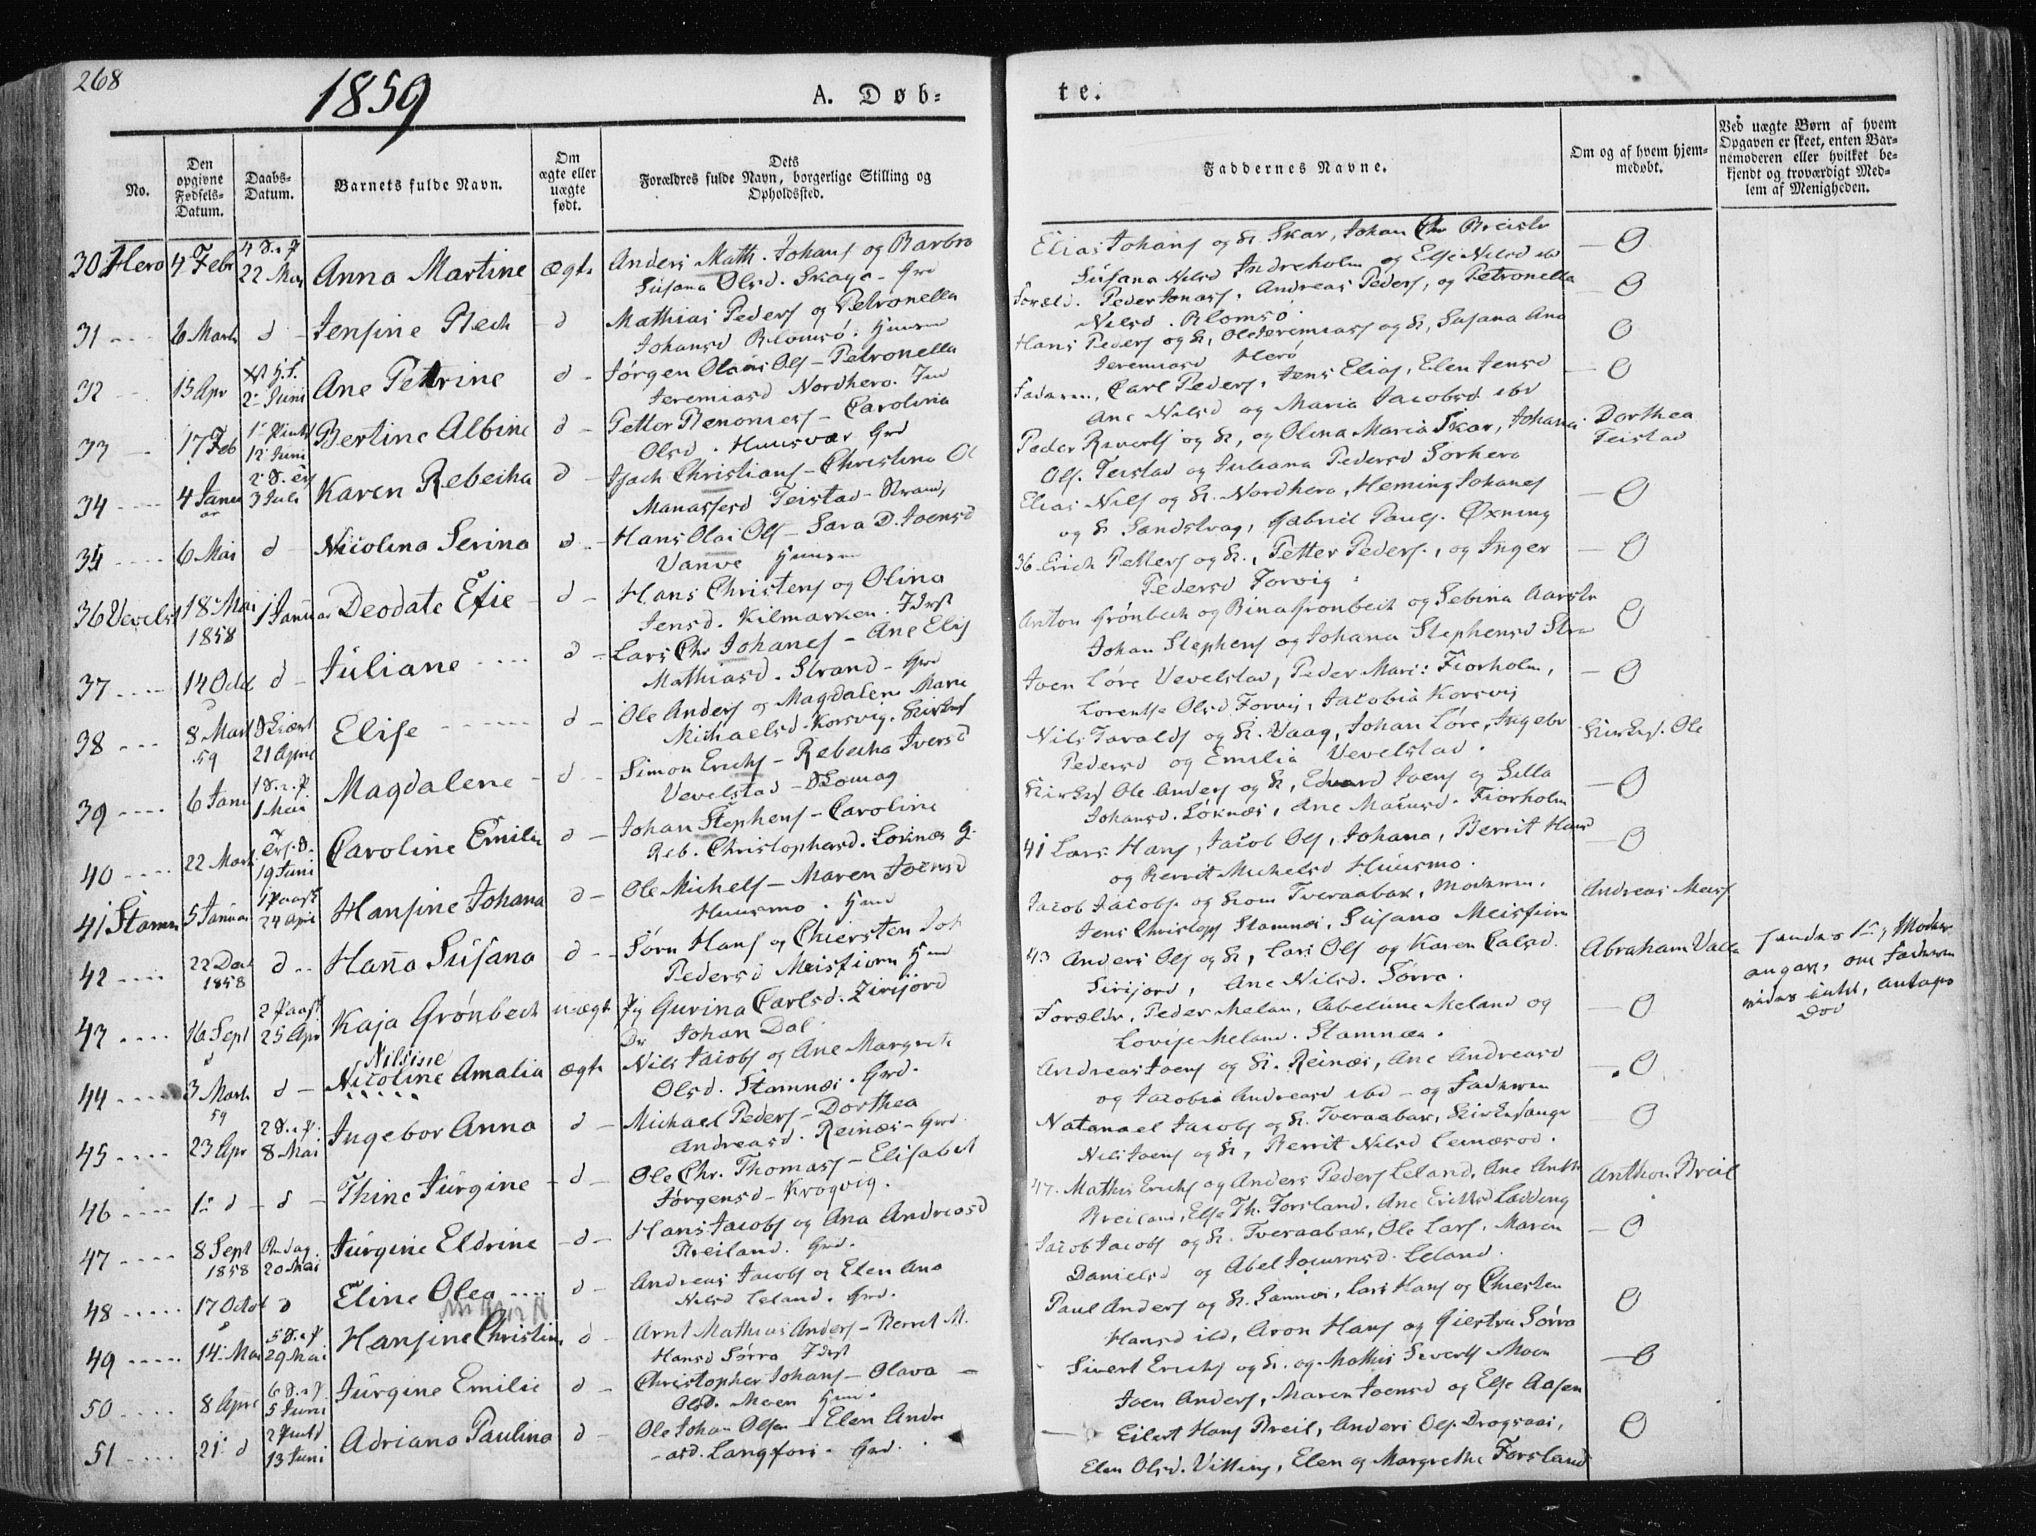 SAT, Ministerialprotokoller, klokkerbøker og fødselsregistre - Nordland, 830/L0446: Ministerialbok nr. 830A10, 1831-1865, s. 268